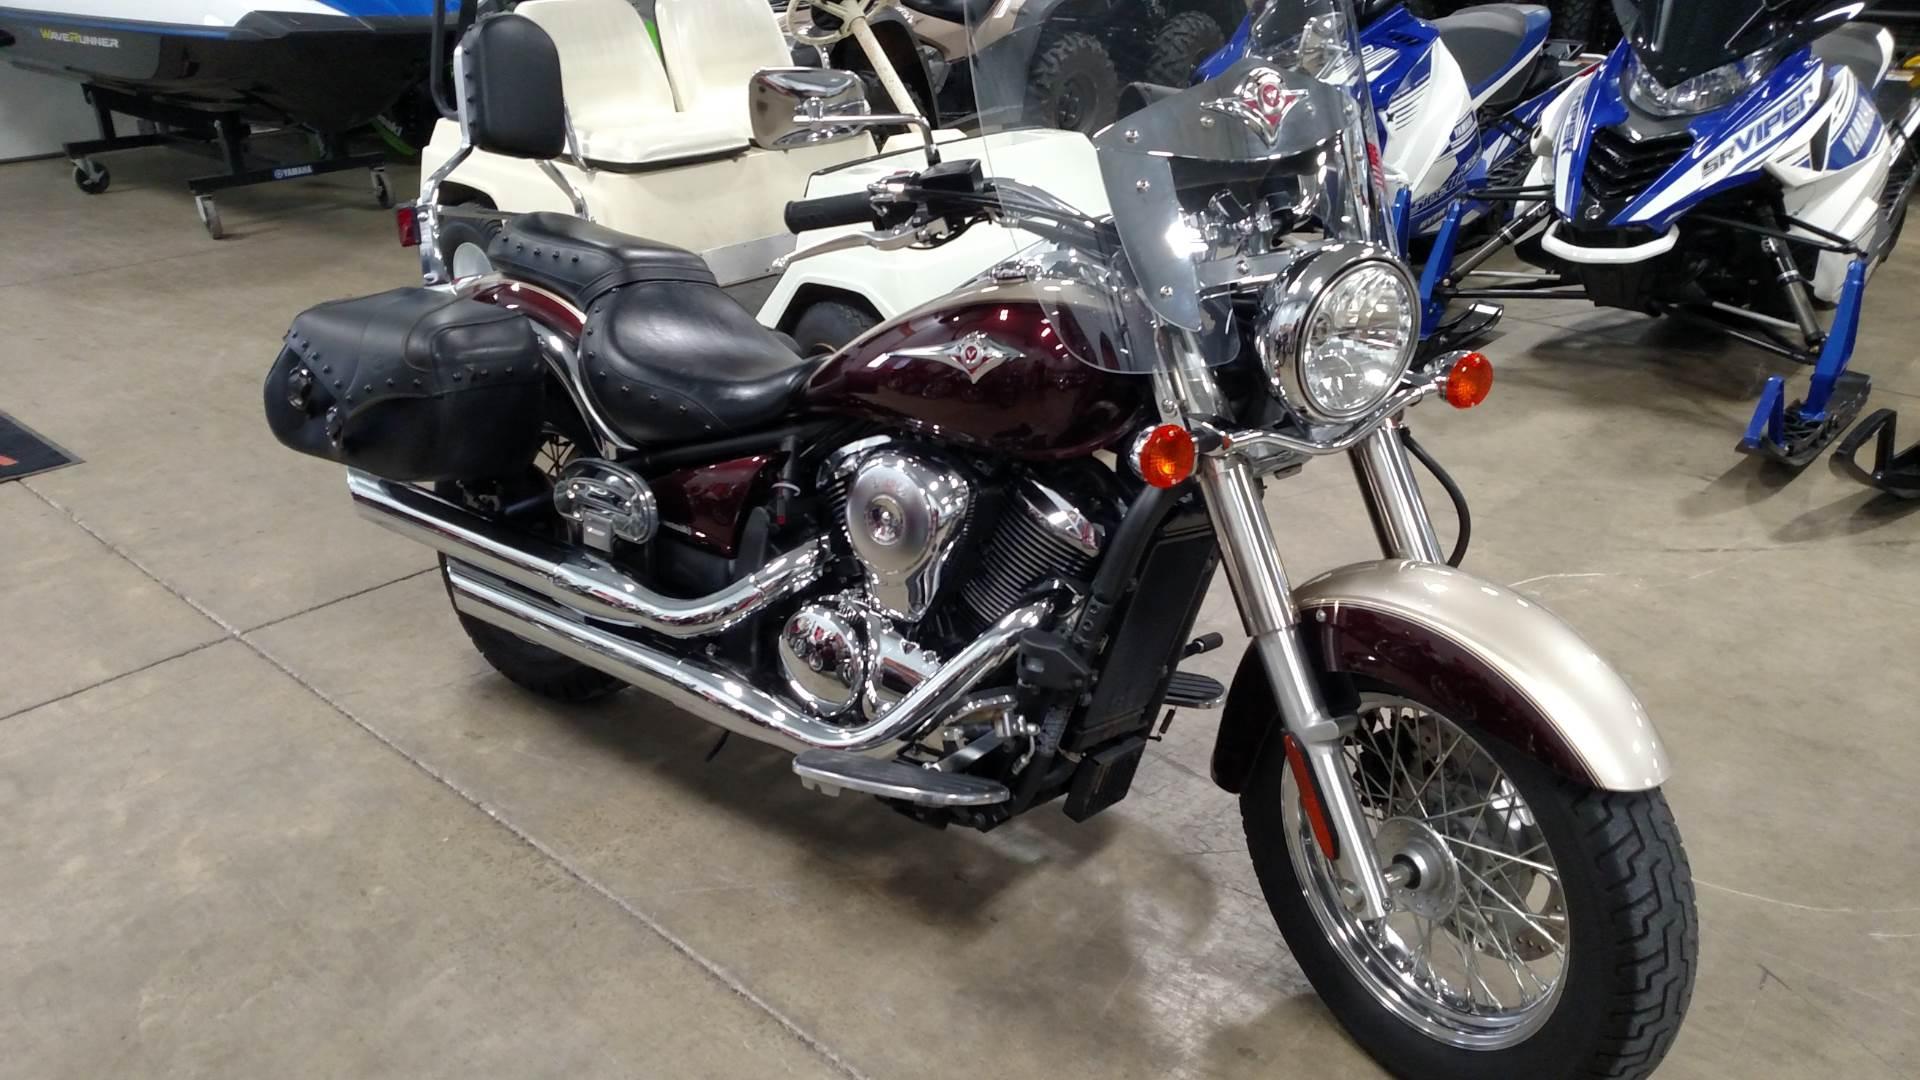 Used 2012 Kawasaki Vulcan® 900 Classic LT Motorcycles in Huron, OH ...